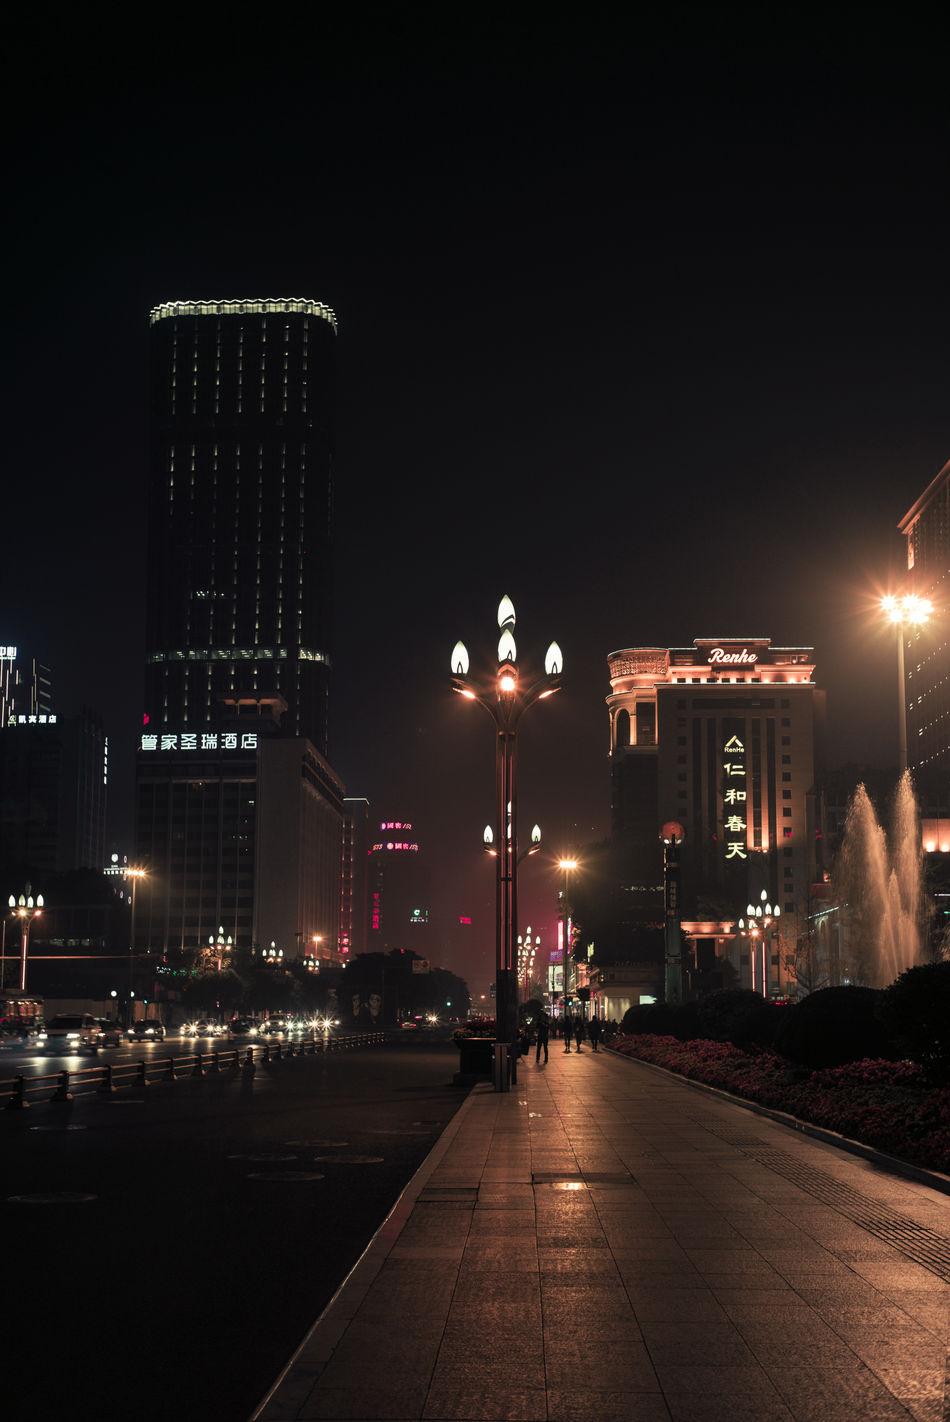 Chengdu Night 2016 Nov 14 Architecture Building Exterior Chengdu China City City Life Cityscape Lonely Night Lights Night View Nightphotography Outdoors Skyscraper Street